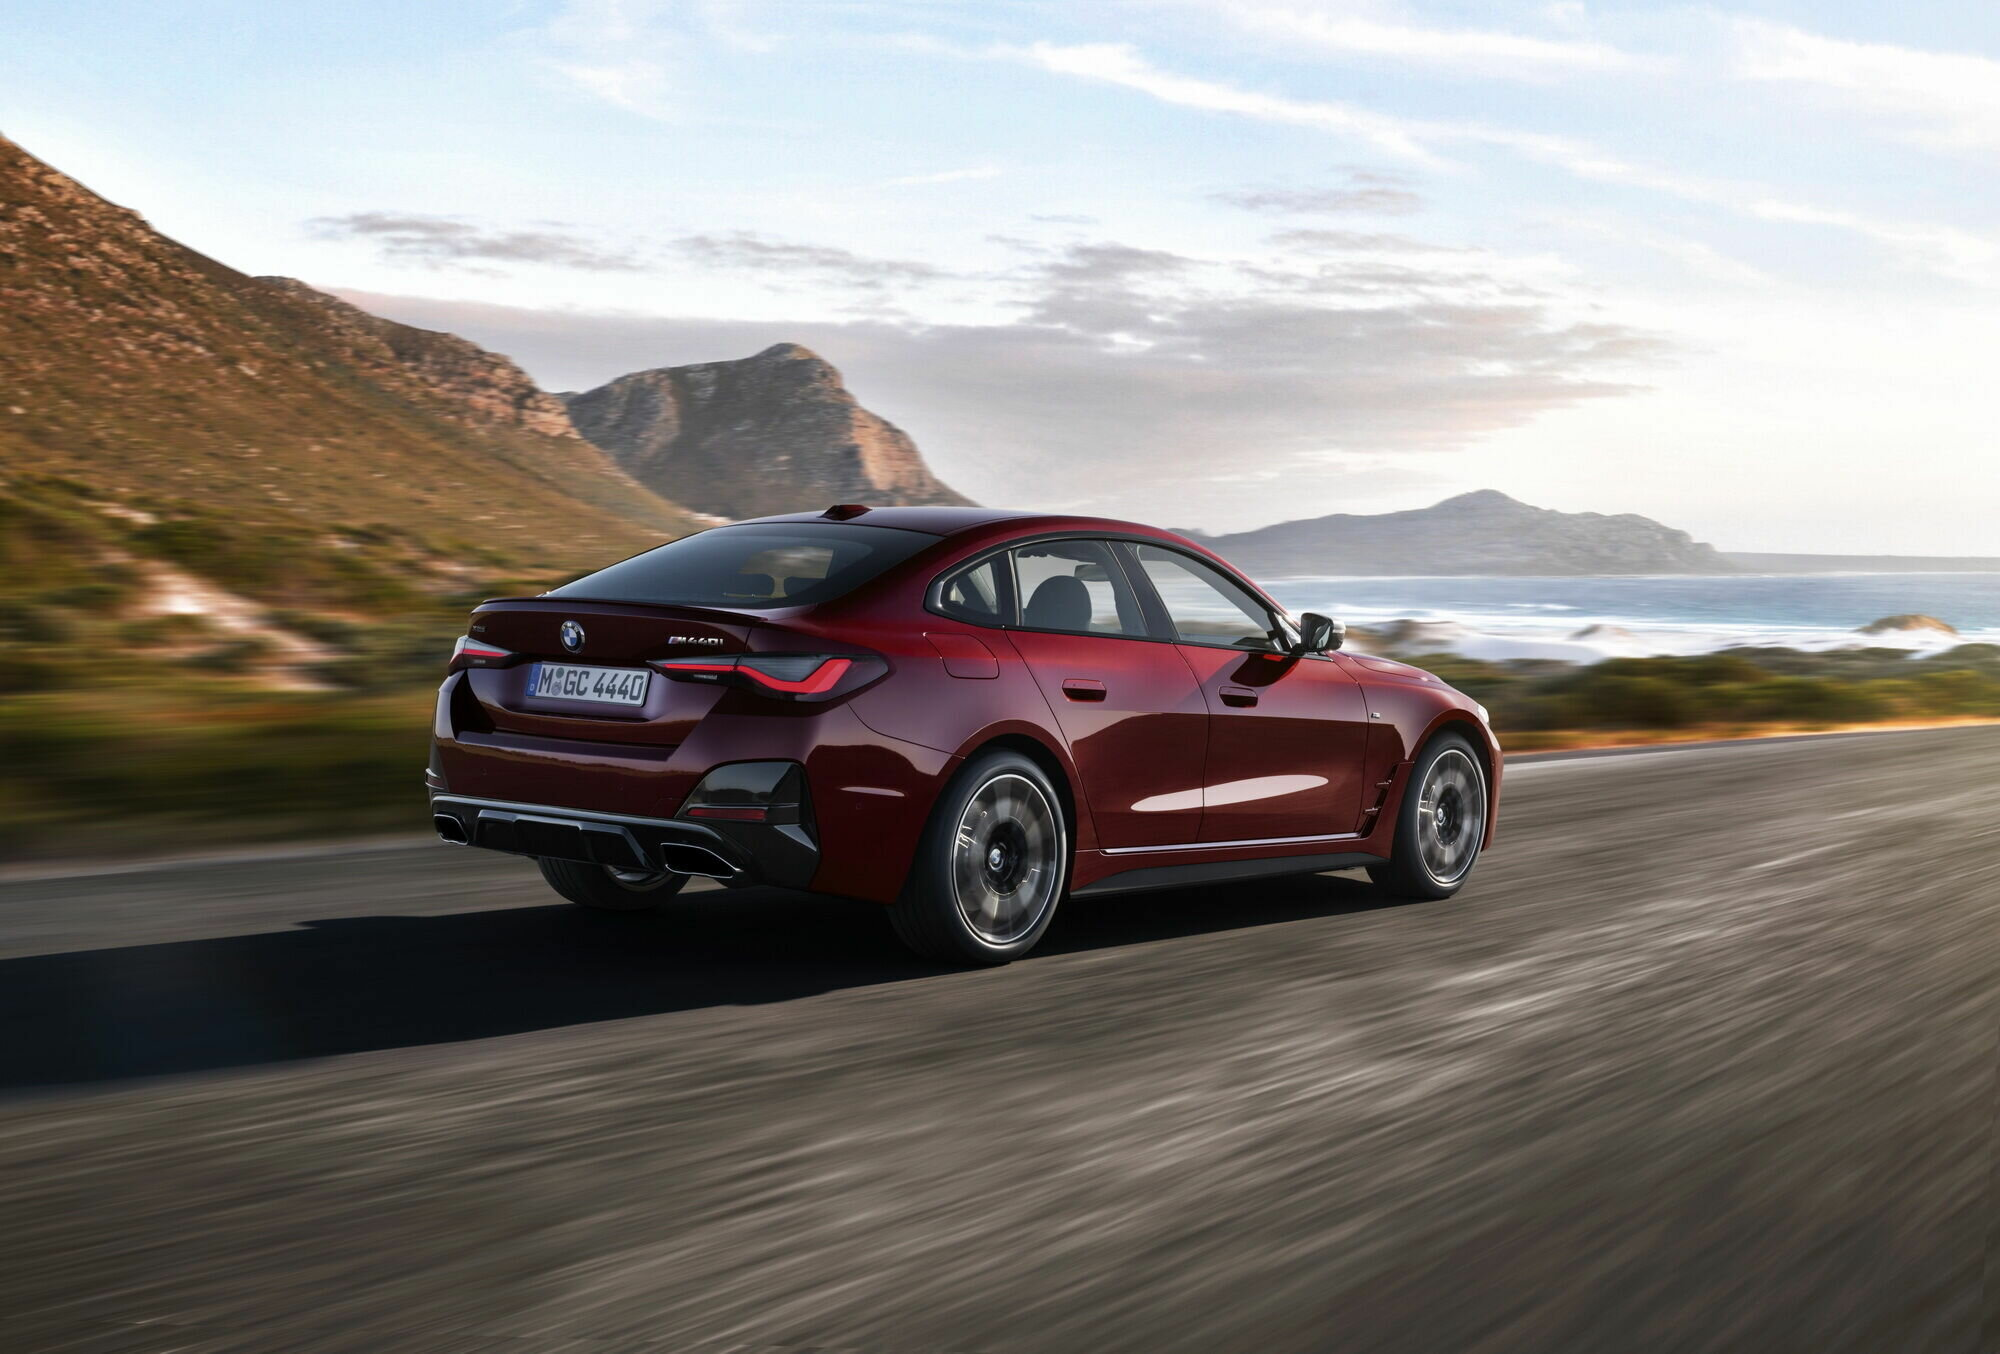 Производство нового спортседана BMW 4-Series Gran Coupe организовано на головном предприятии компании в Мюнхене